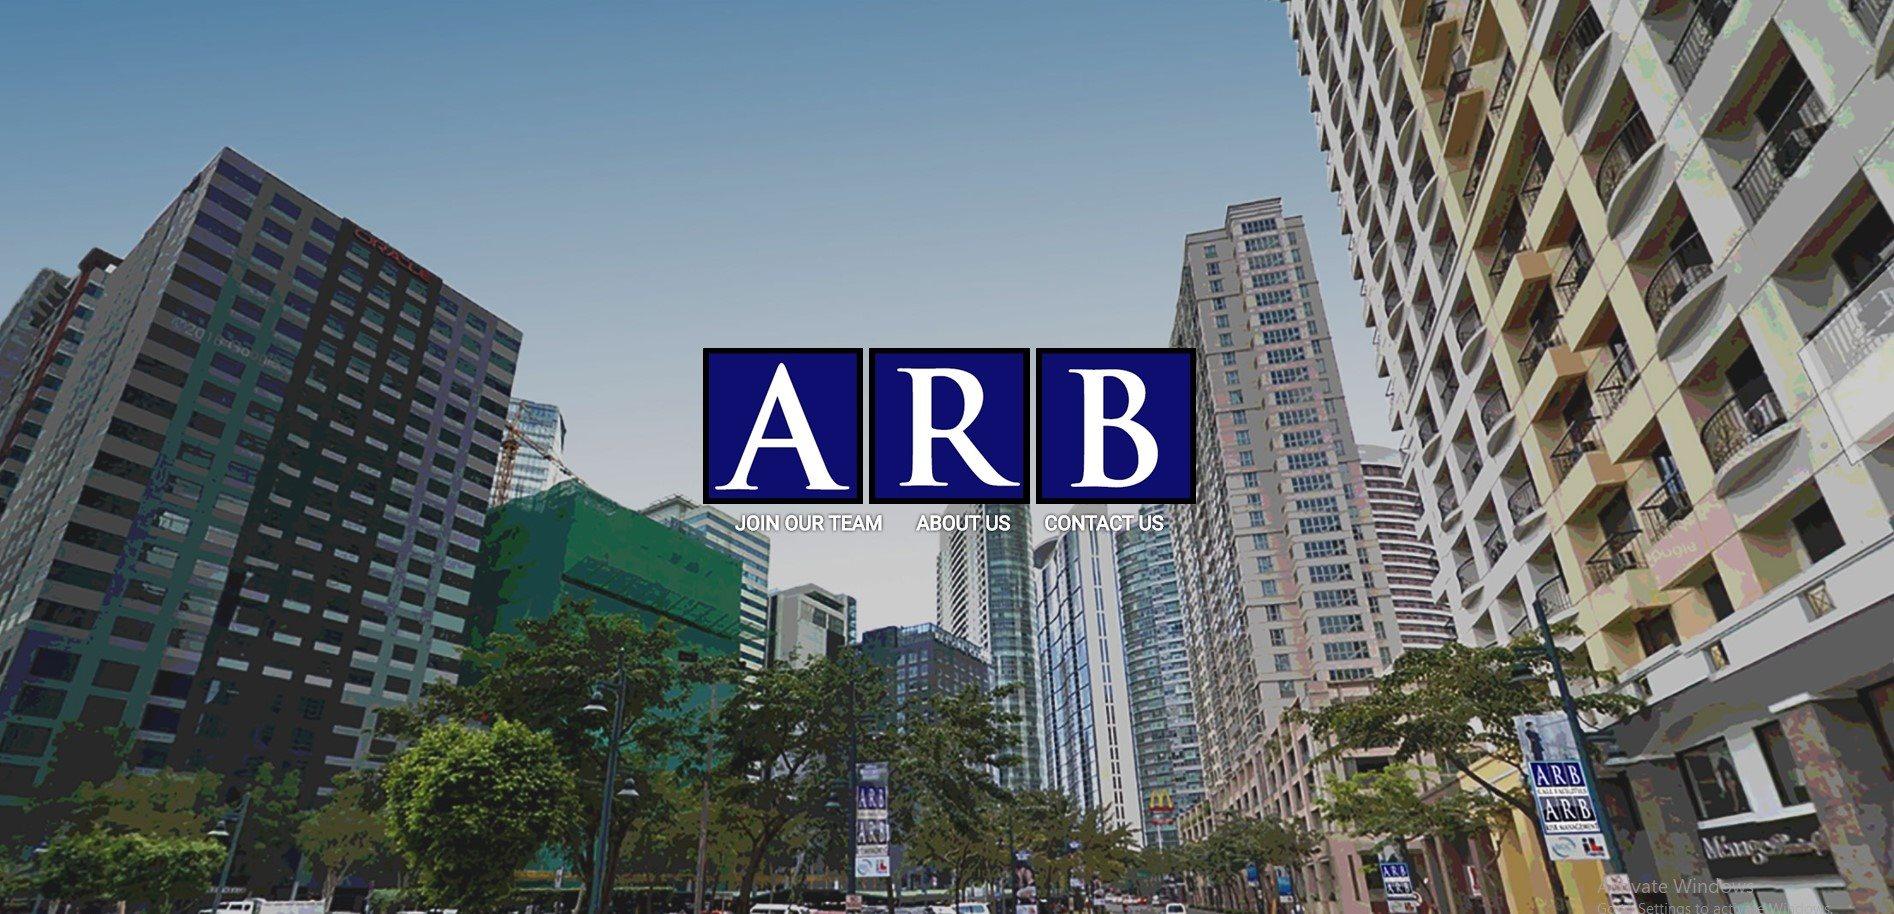 ARB Call Facilities